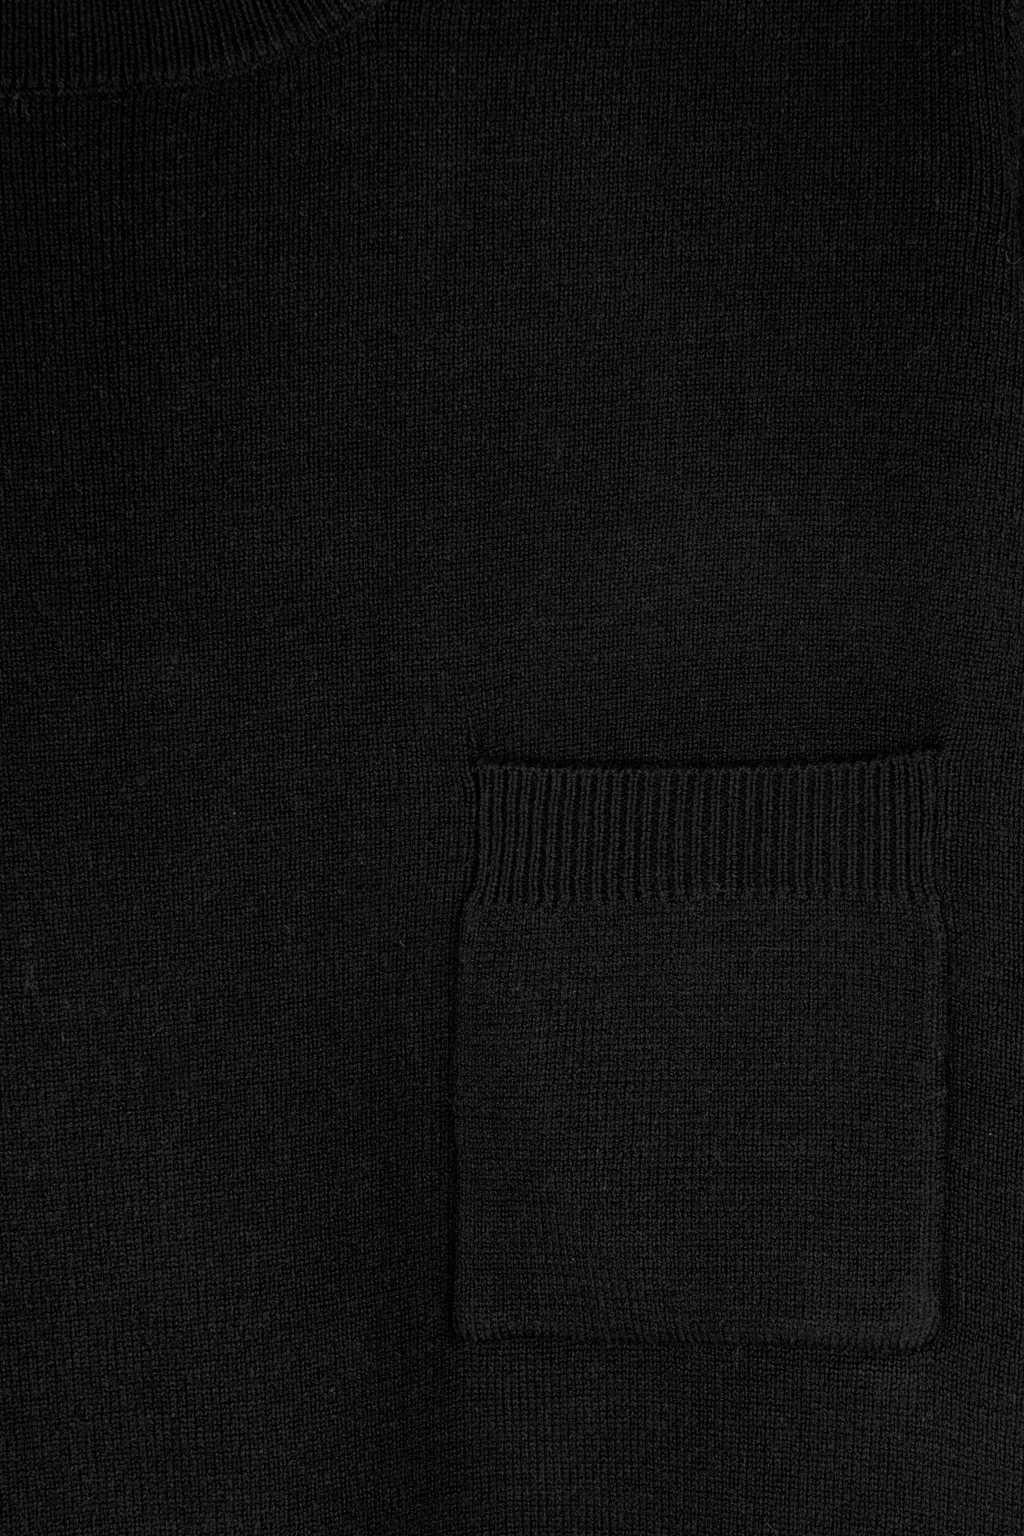 Sweater 3070 Black 10